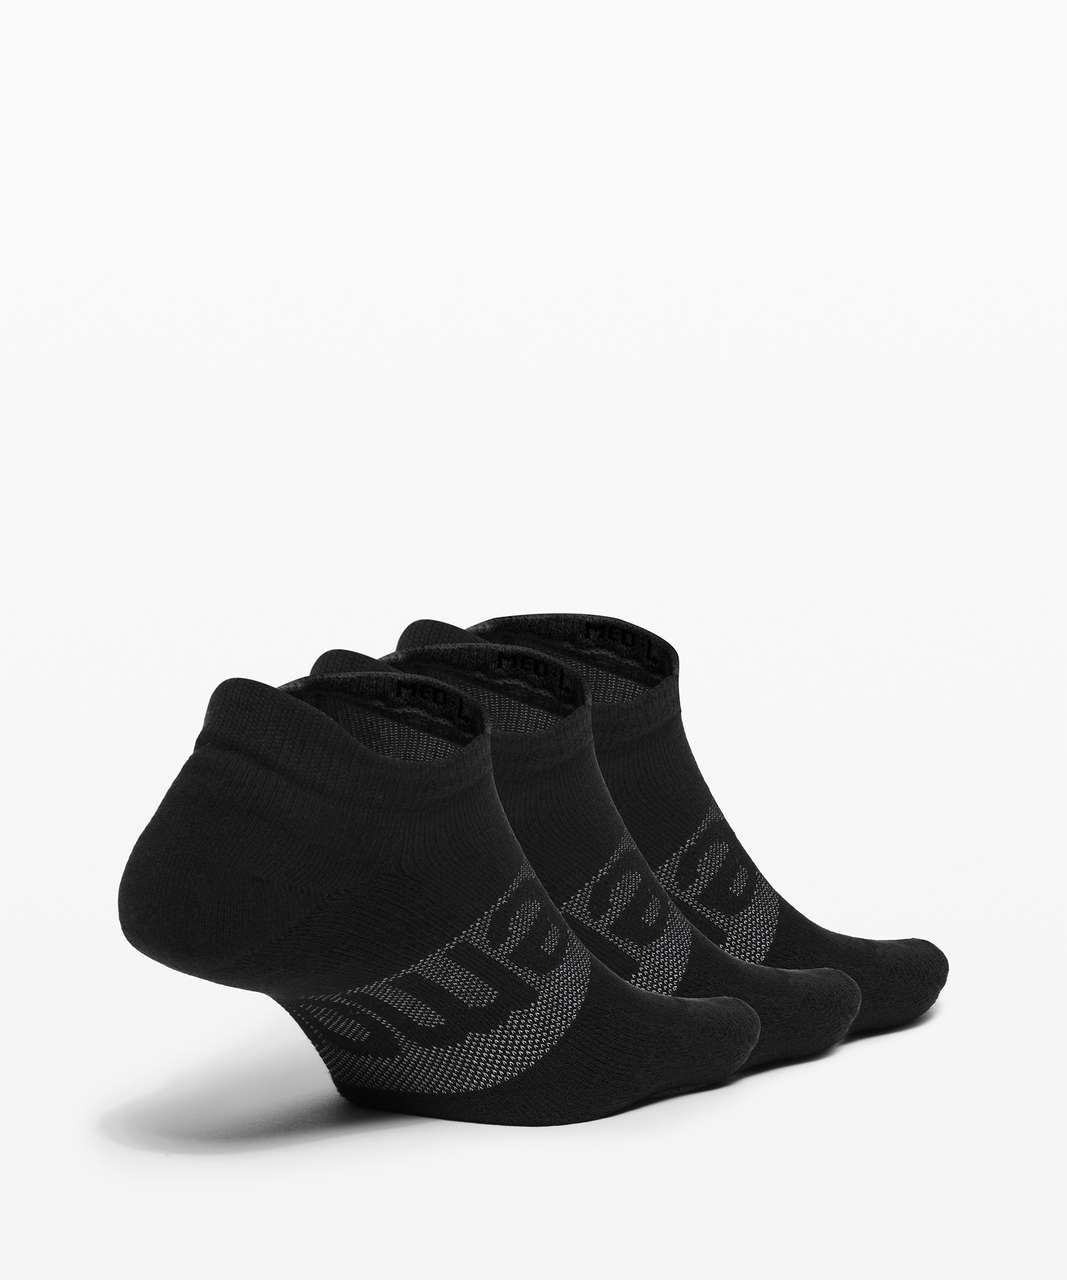 Lululemon Daily Stride Low Ankle Sock *3 Pack - Black